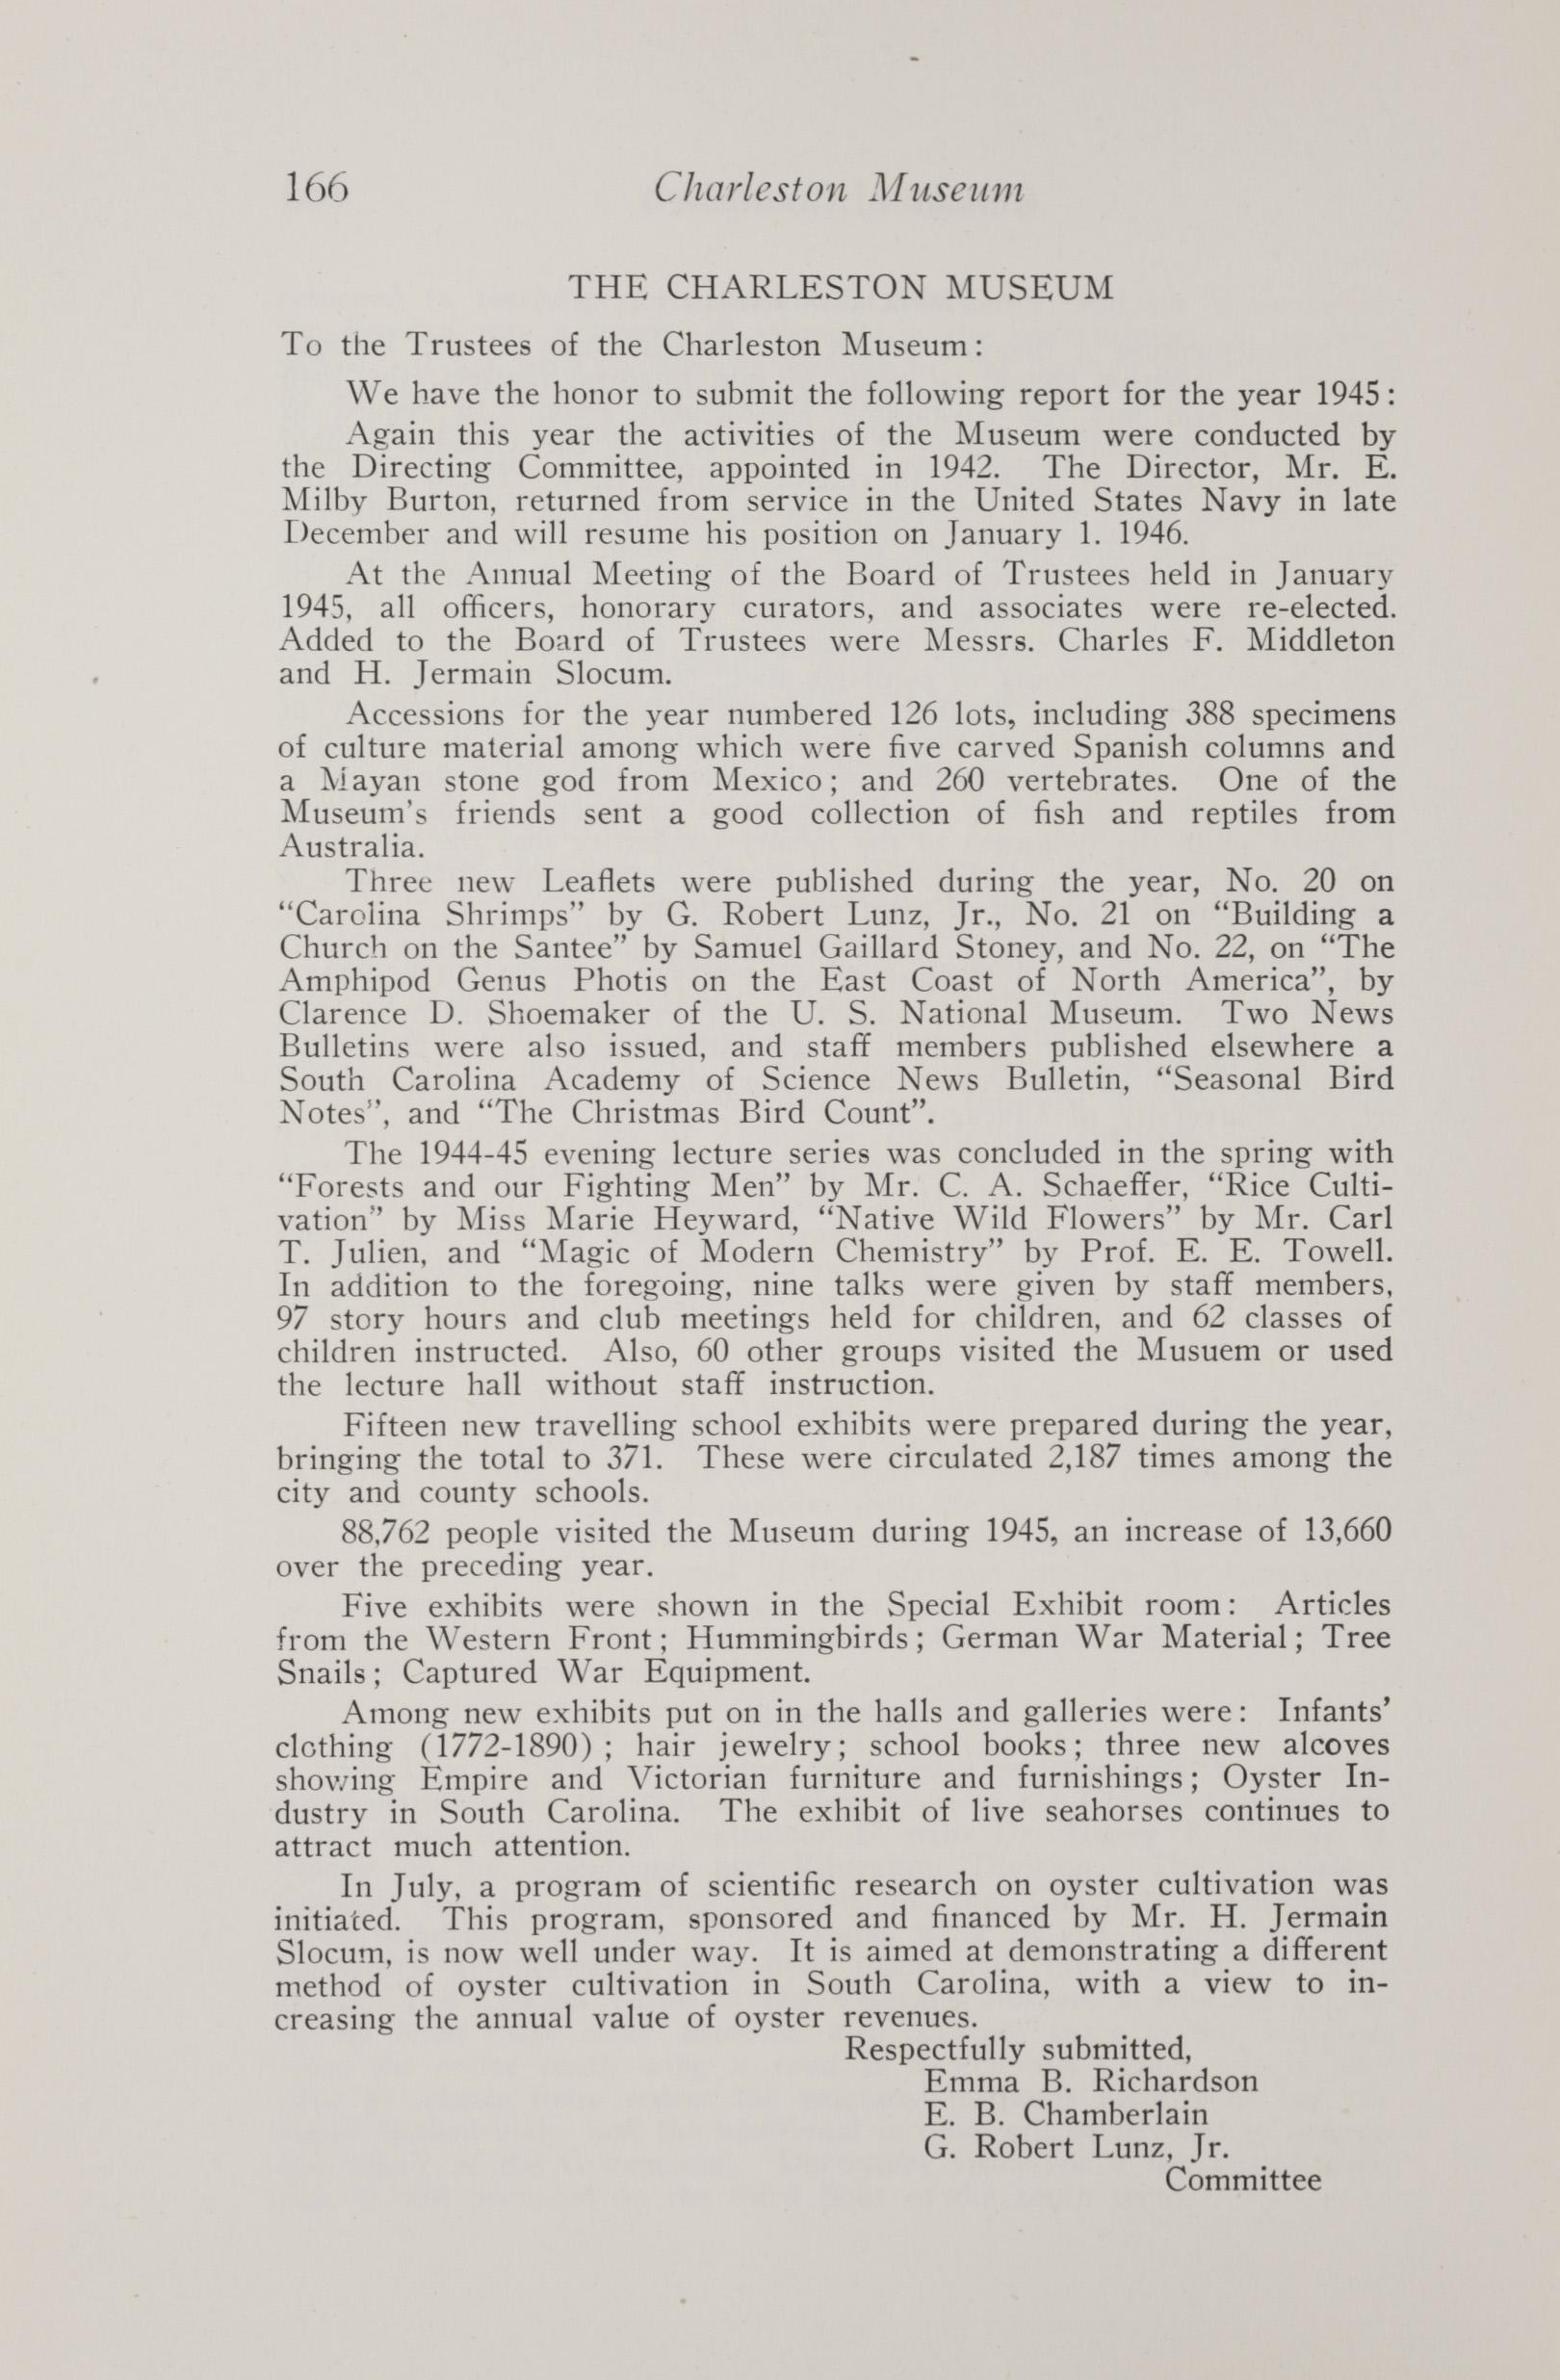 Charleston Yearbook, 1945, page 166